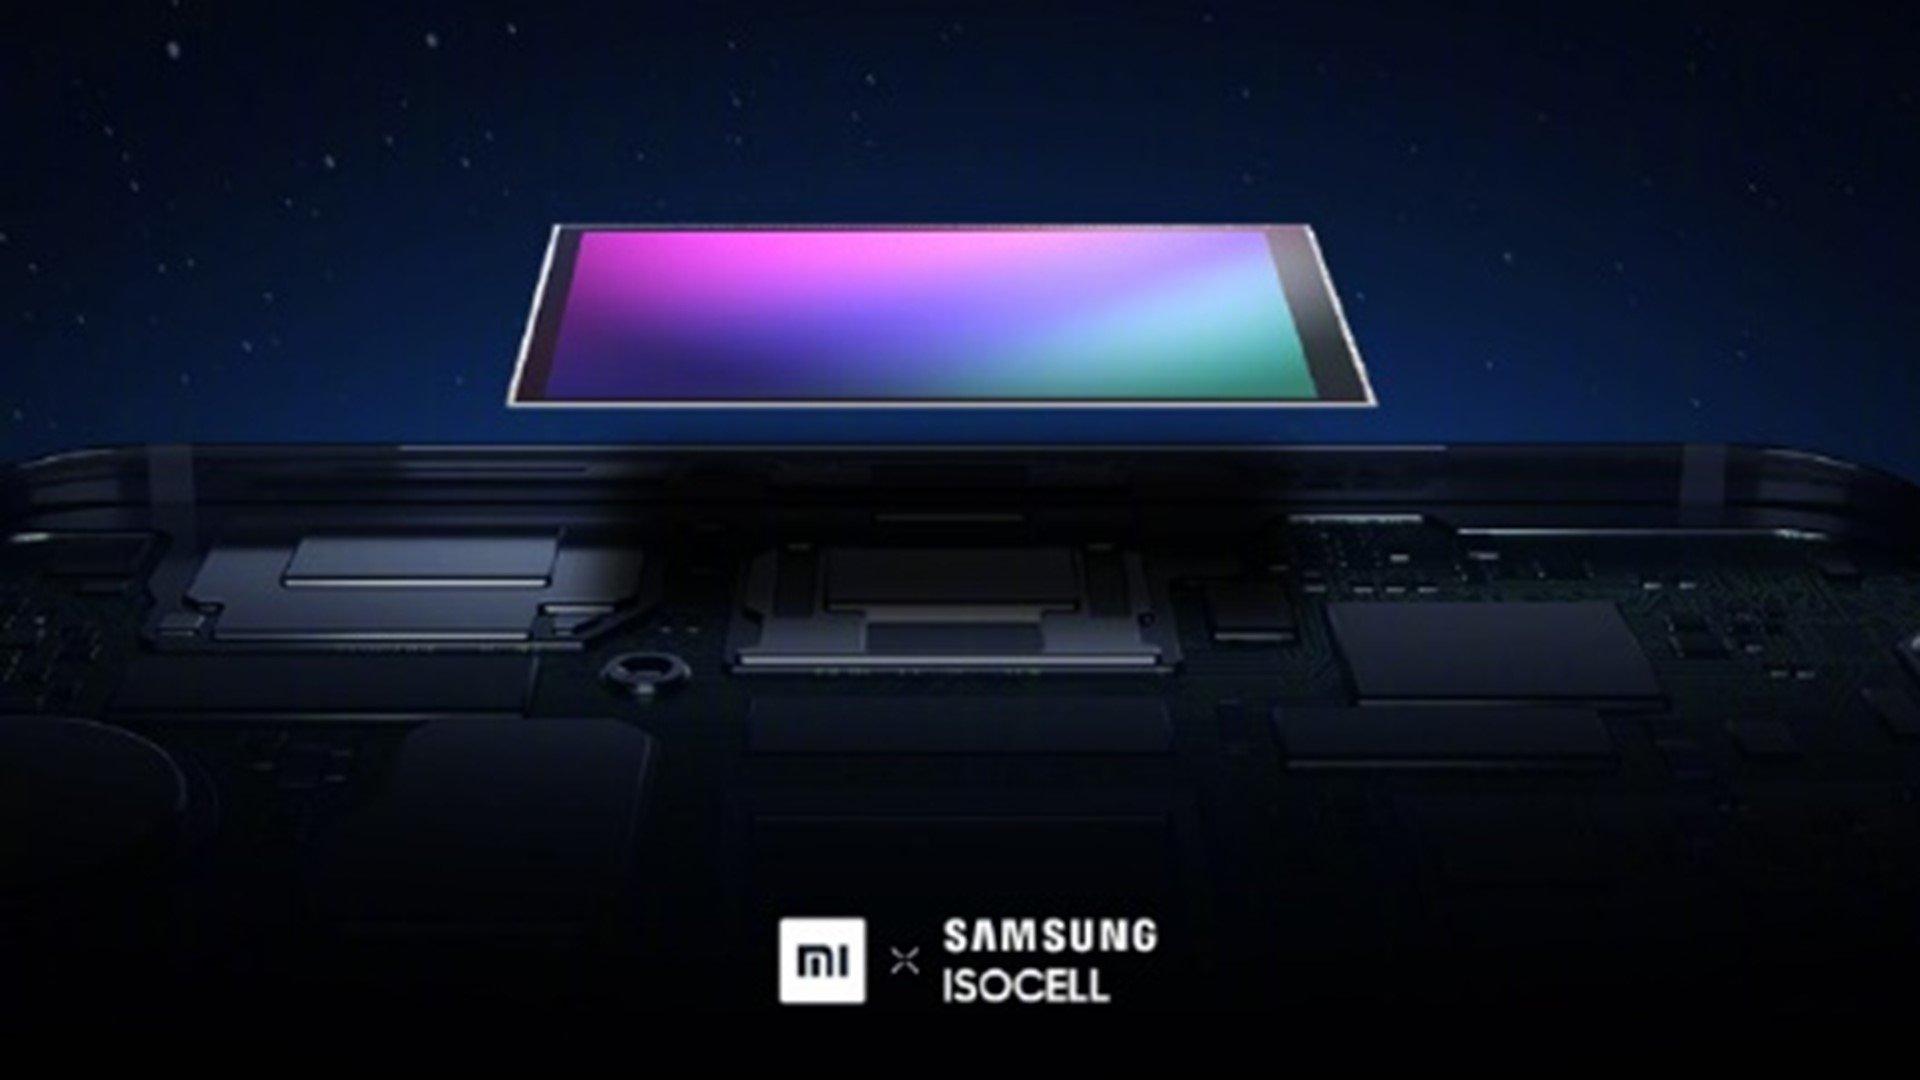 Samsung ToF 3D Sensor